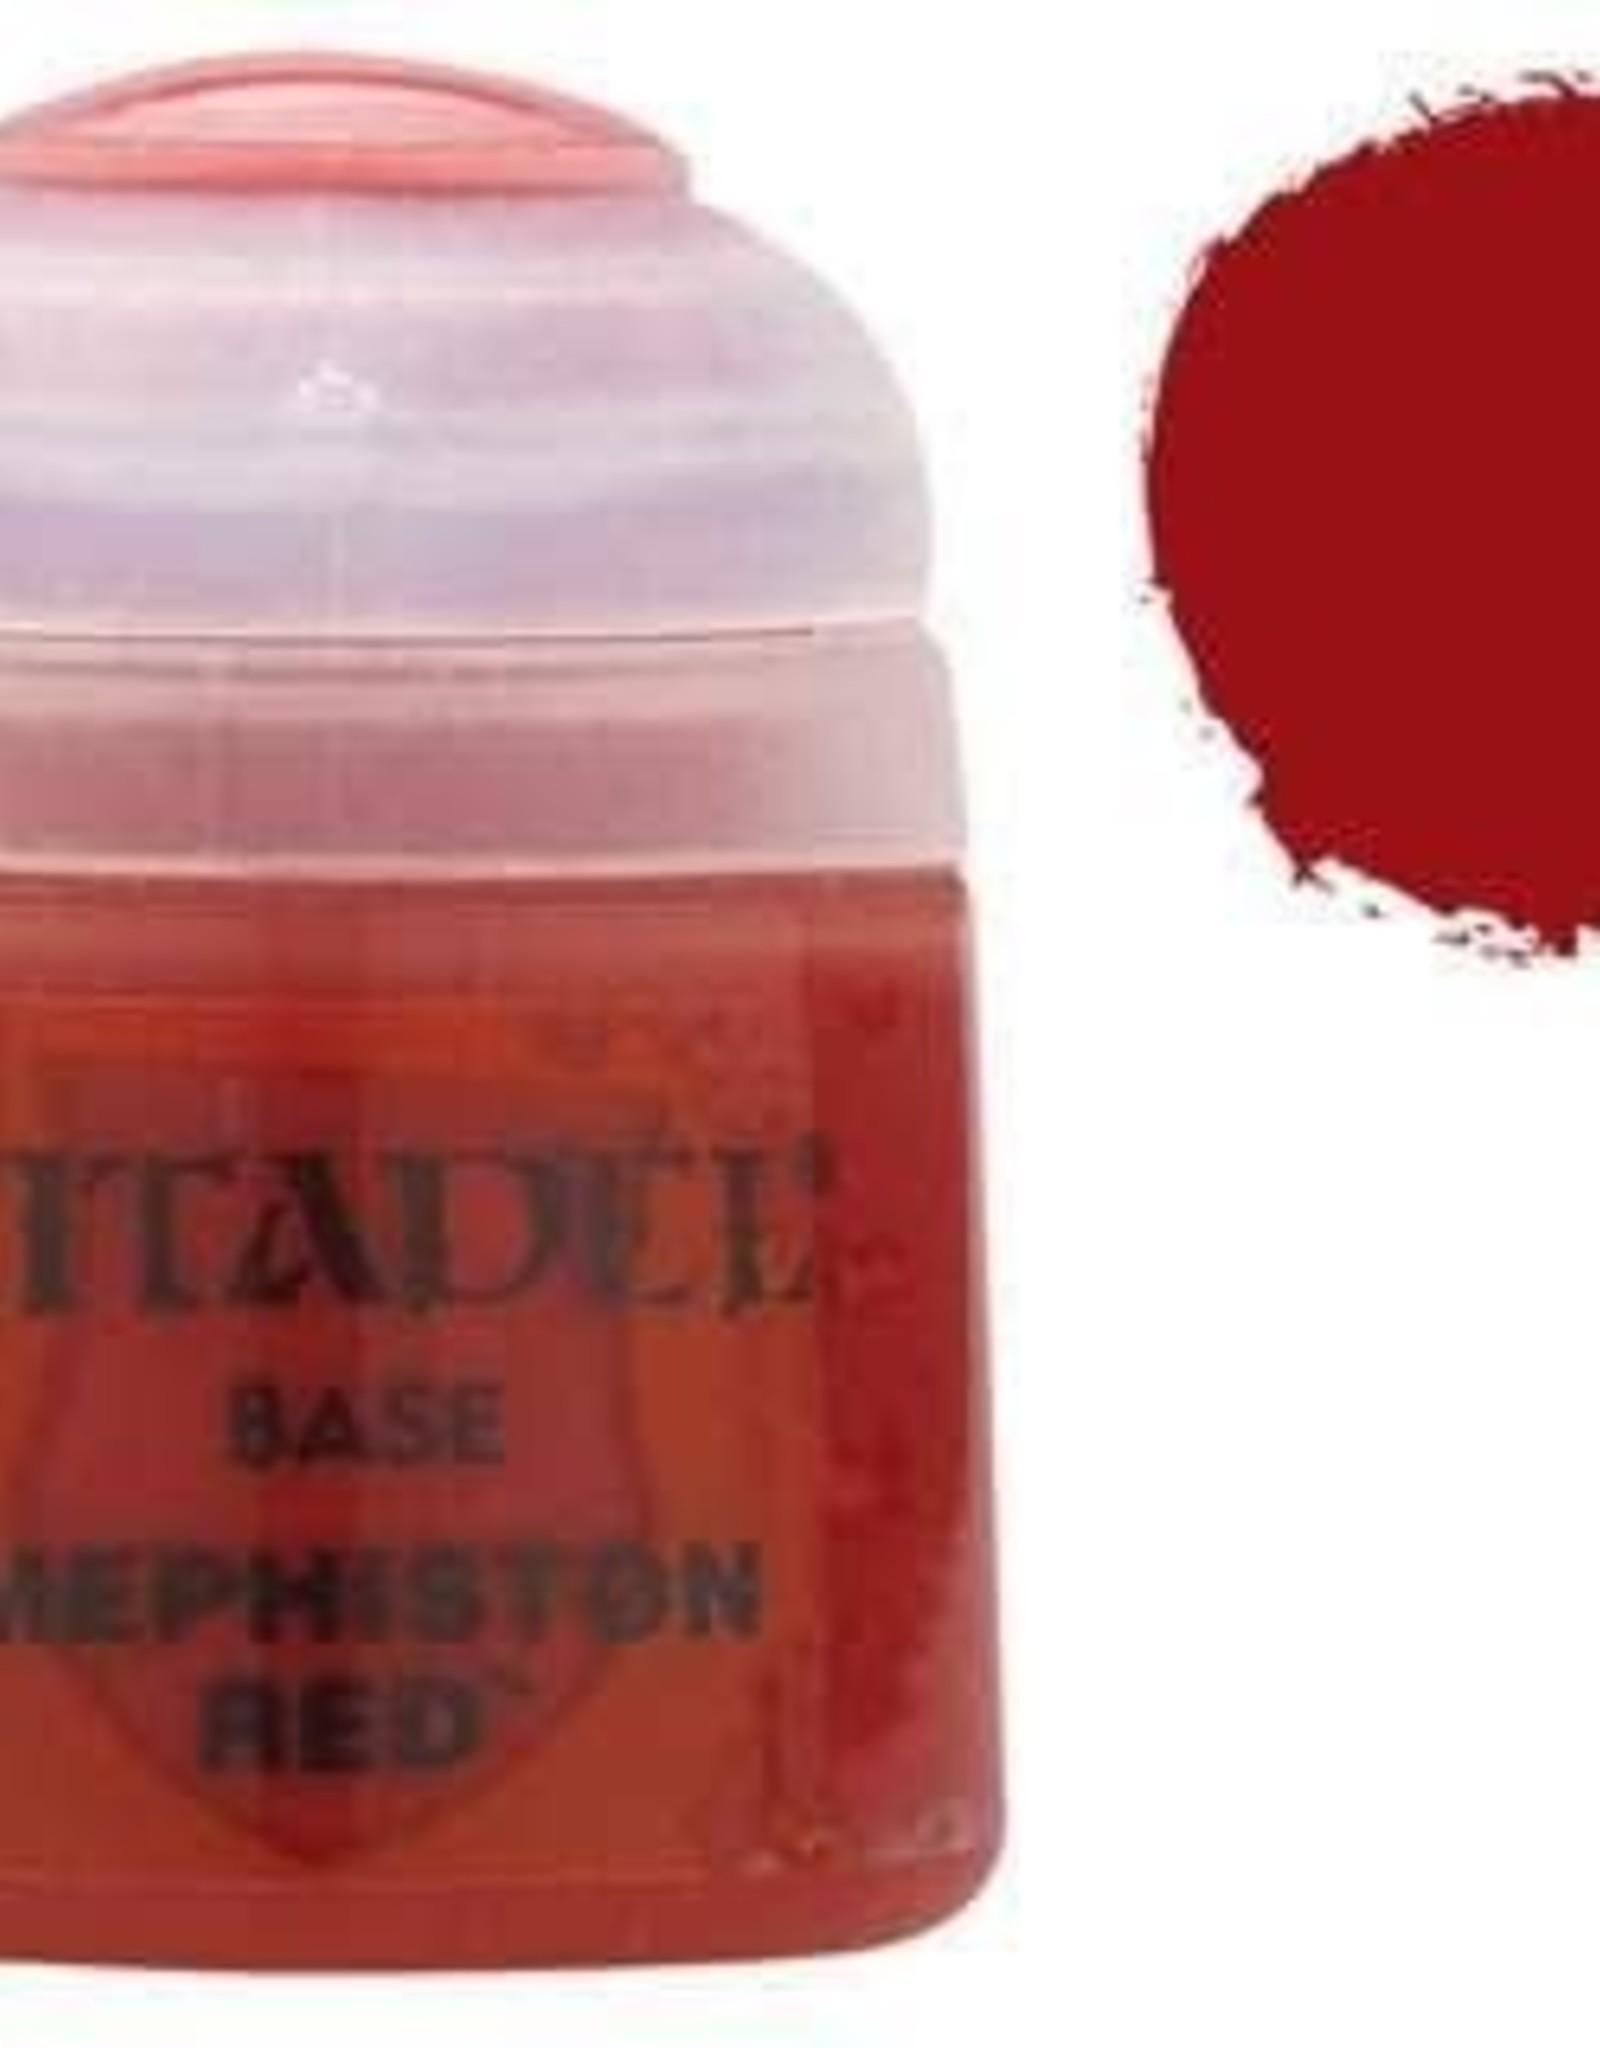 Games Workshop Citadel Paint: Base - Mephiston Red